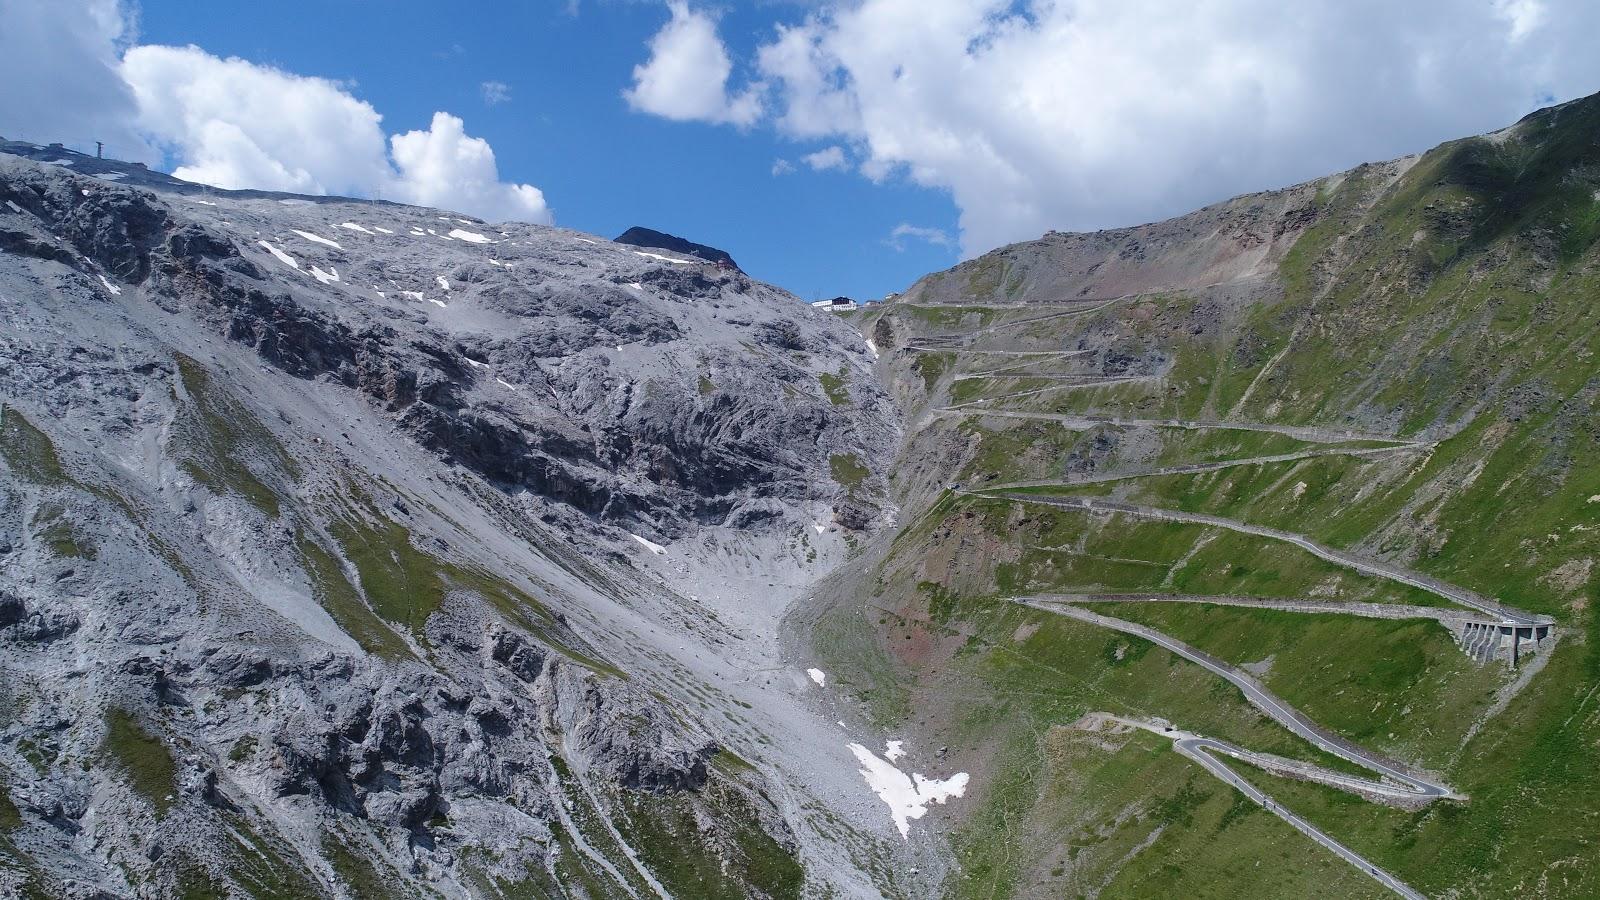 Climbing Stelvio by bike from Prato alla Stelvio - aerial drone photo of tornanti (hairpins) leading to the pass, top of stelvio